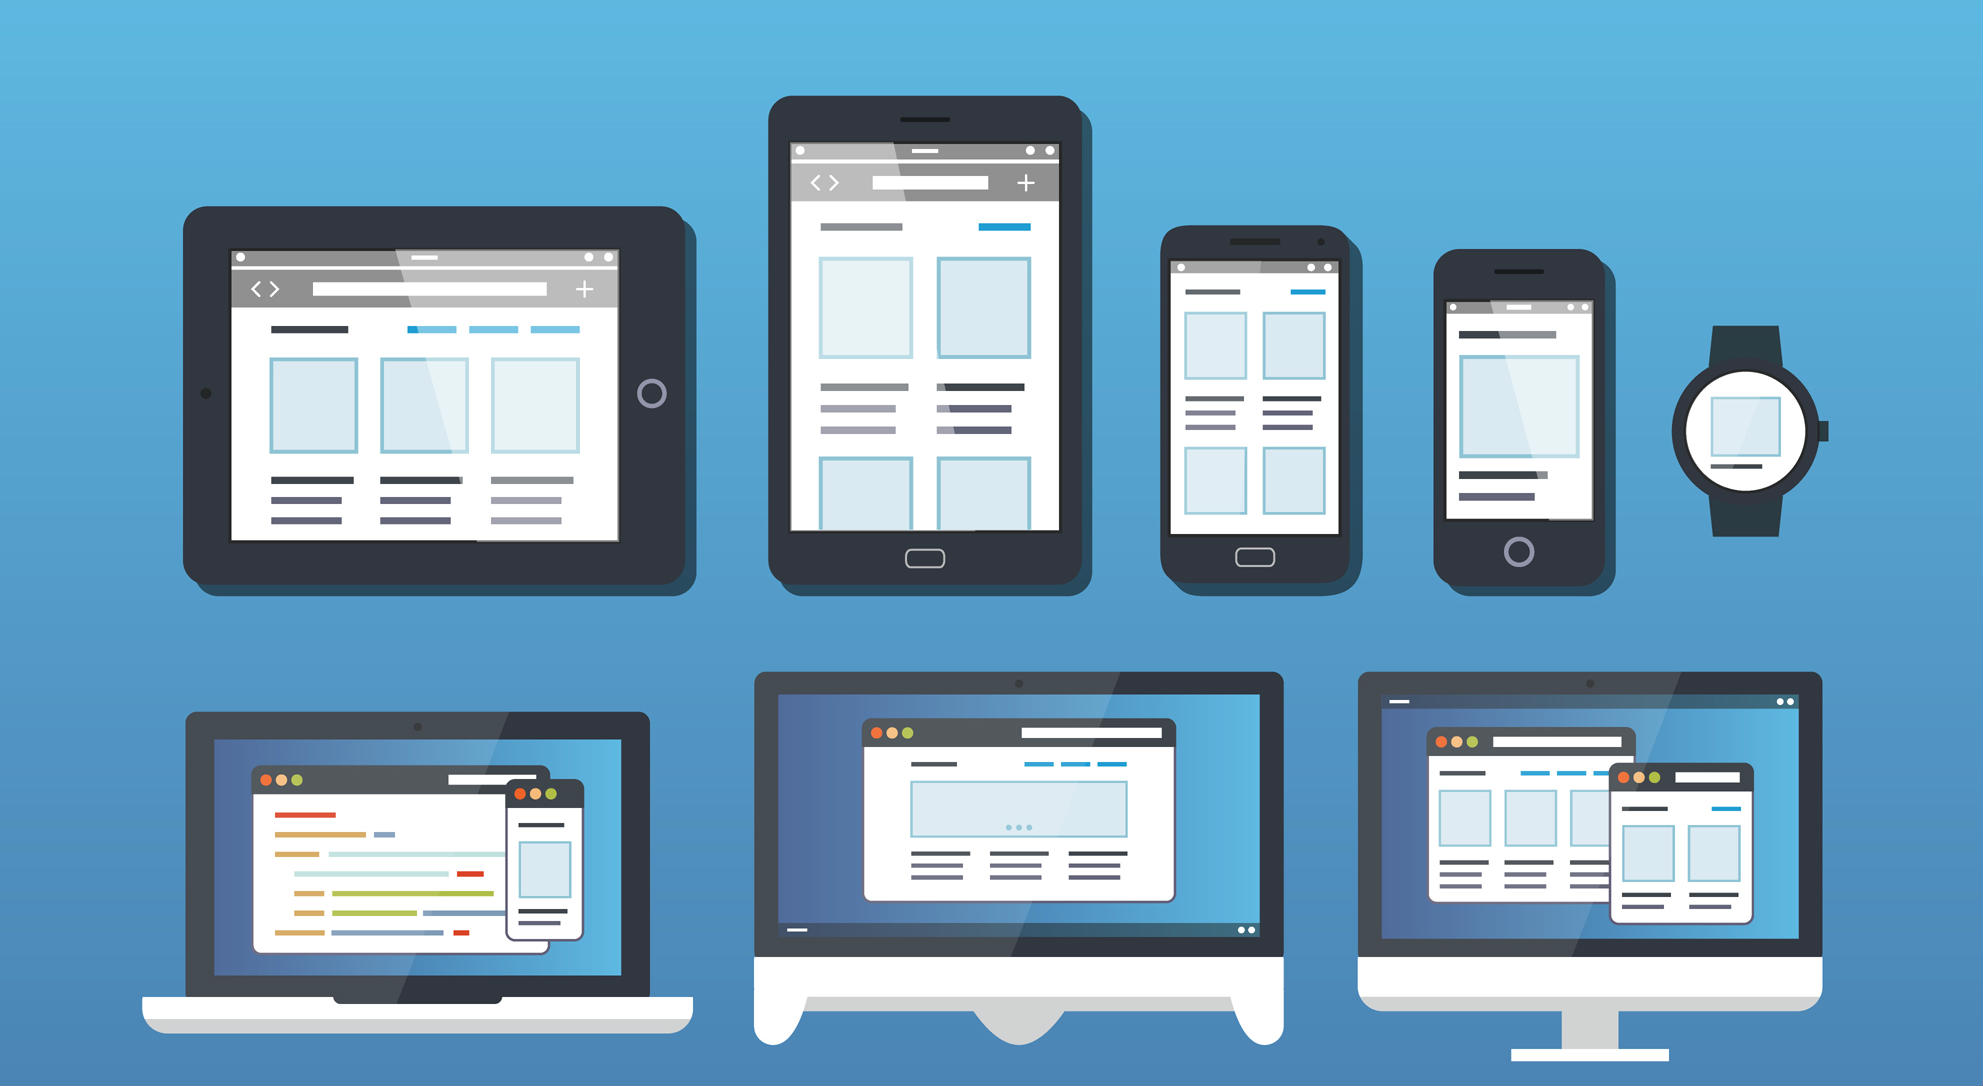 Diseño responsive en distintas pantallas